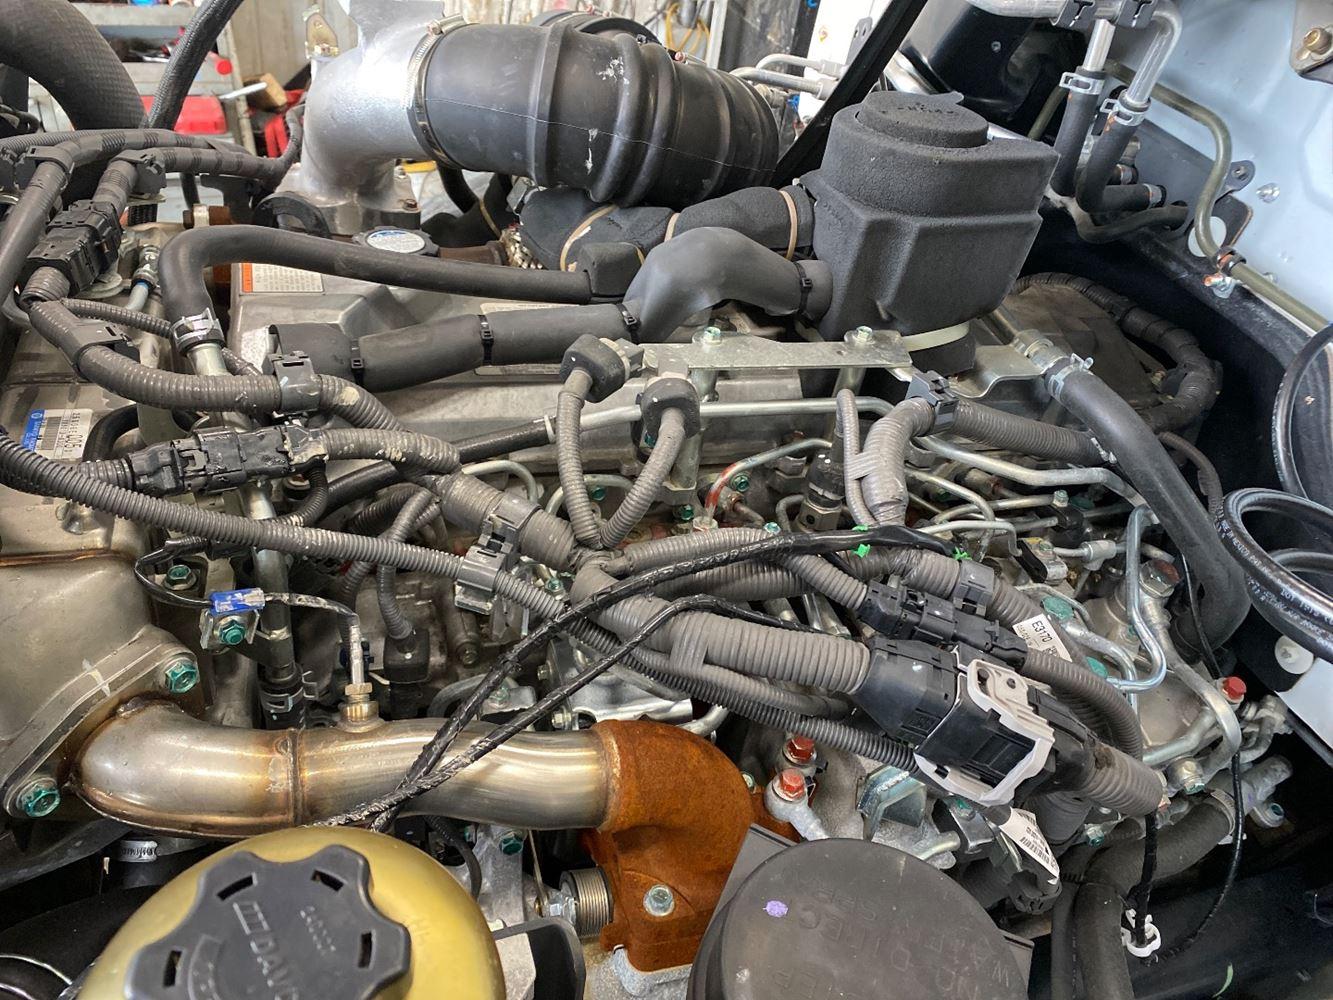 2019 HINO J08E-WU ENGINE ASSEMBLY TRUCK PARTS #721231